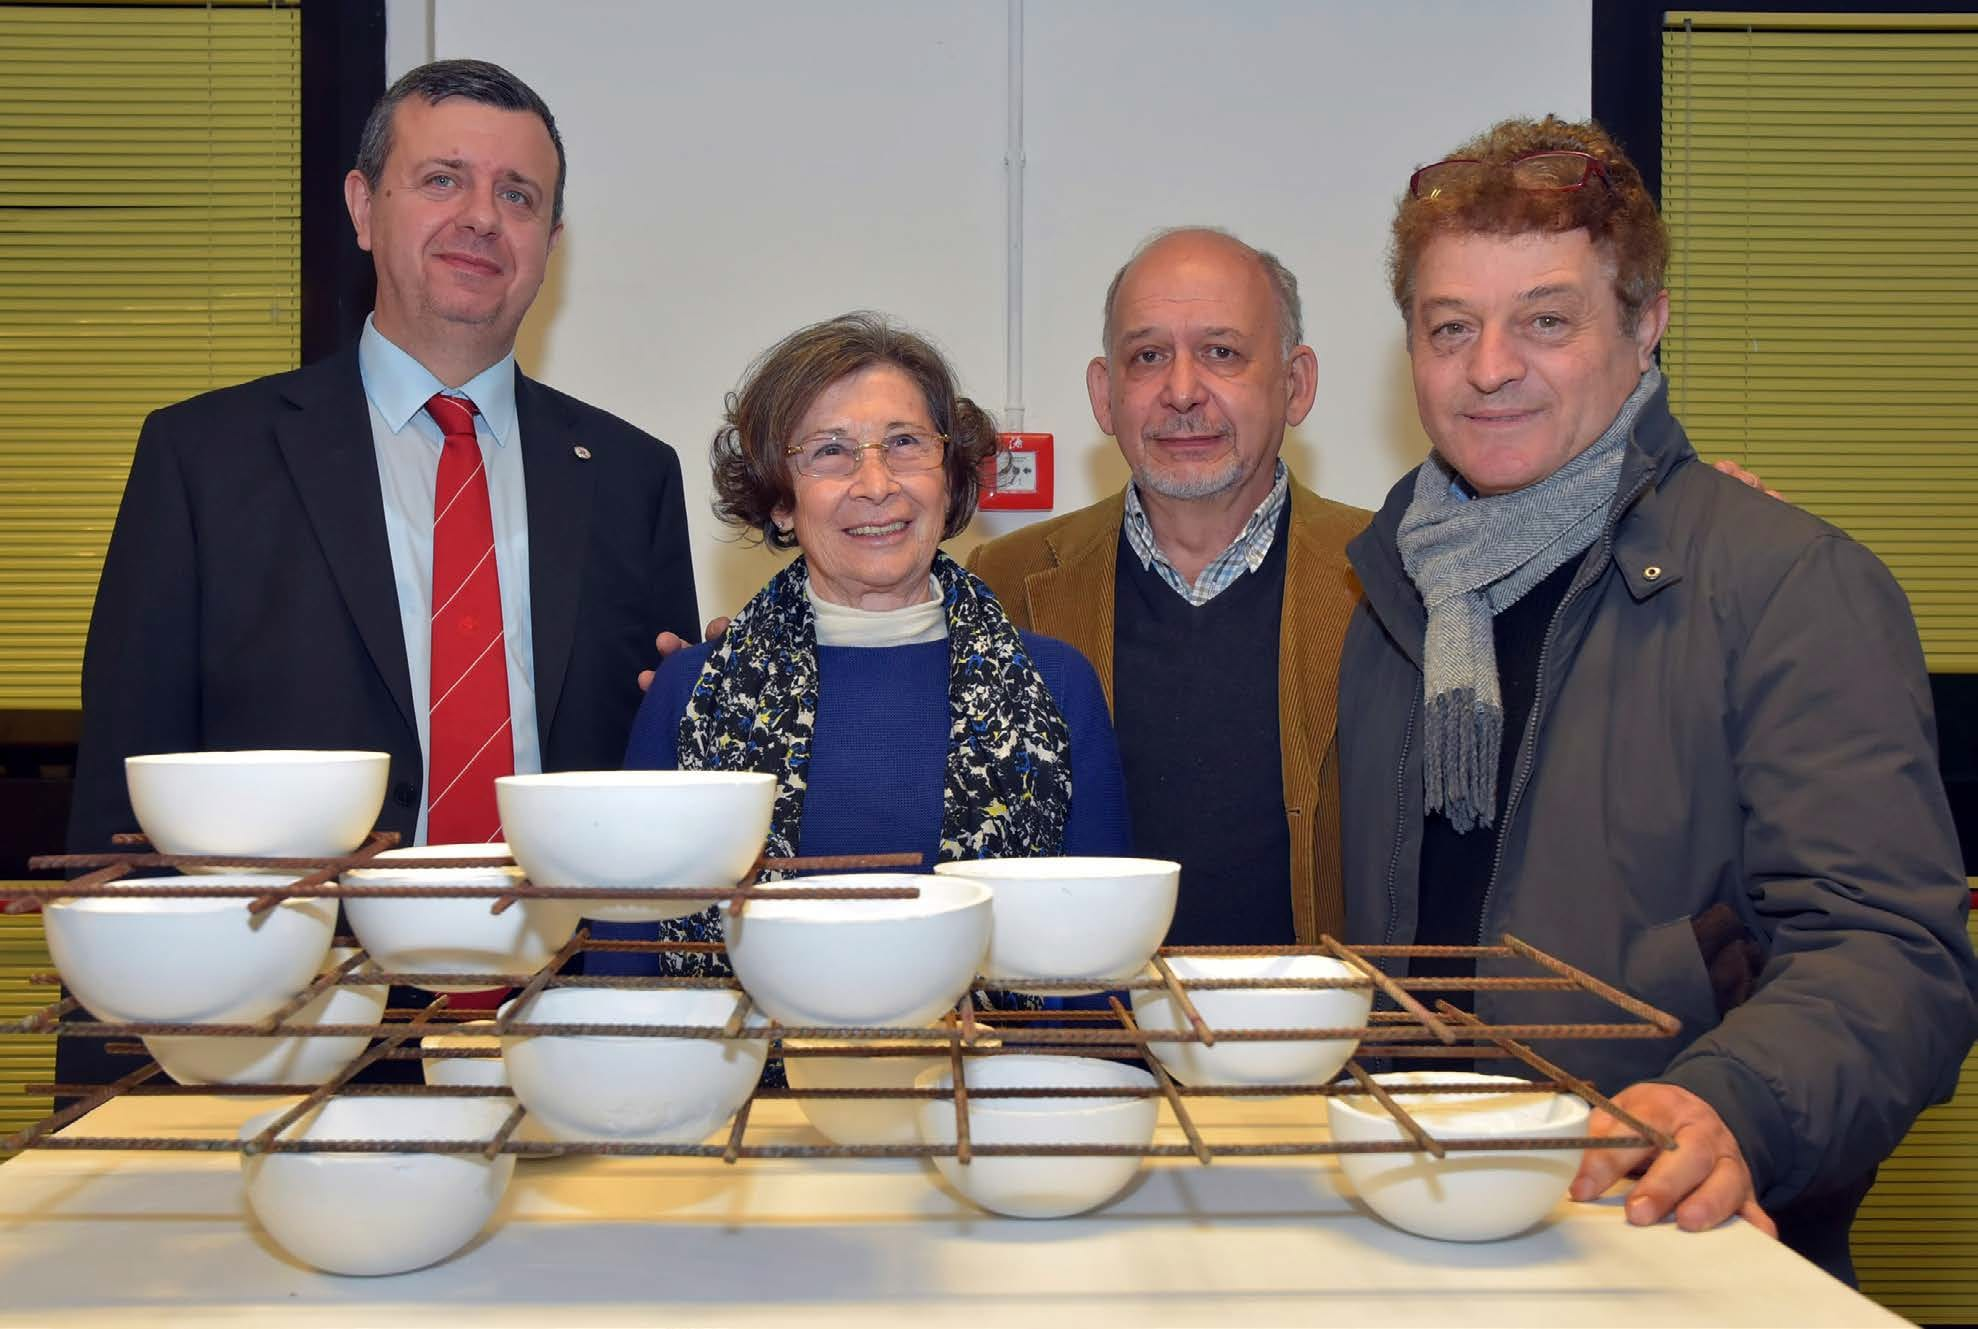 Maurizio Ettore Maccarni, Delfina Camurati, Adriano Campisi, Gianni Pedullà